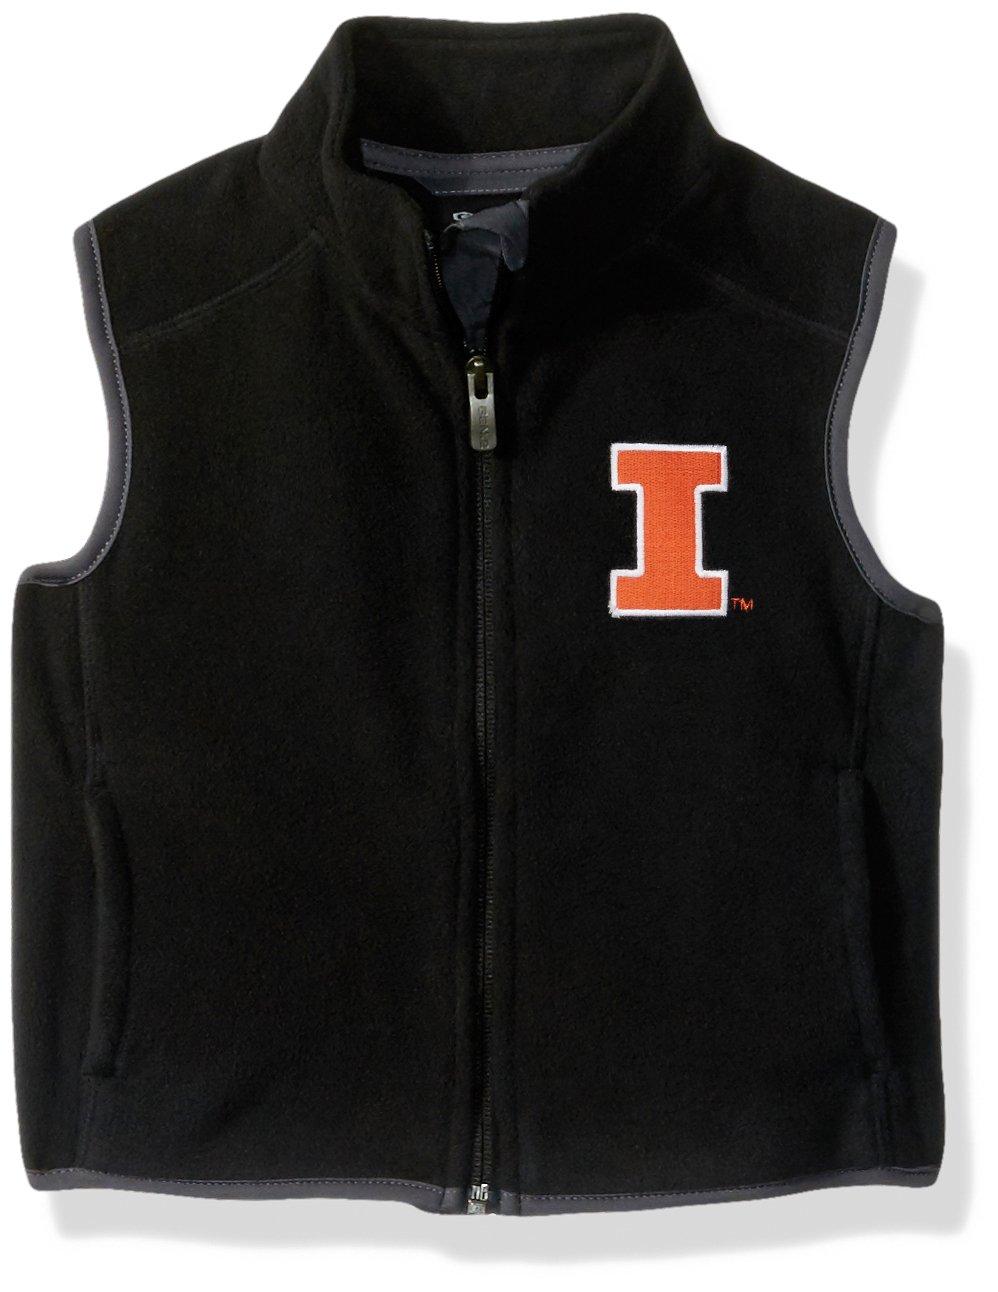 NCAA by Outerstuff NCAA Illinois Illini Kids & Youth Boys ''Scrimmage'' Polar Fleece Vest, Black, Kids Medium(5-6) by Outerstuff